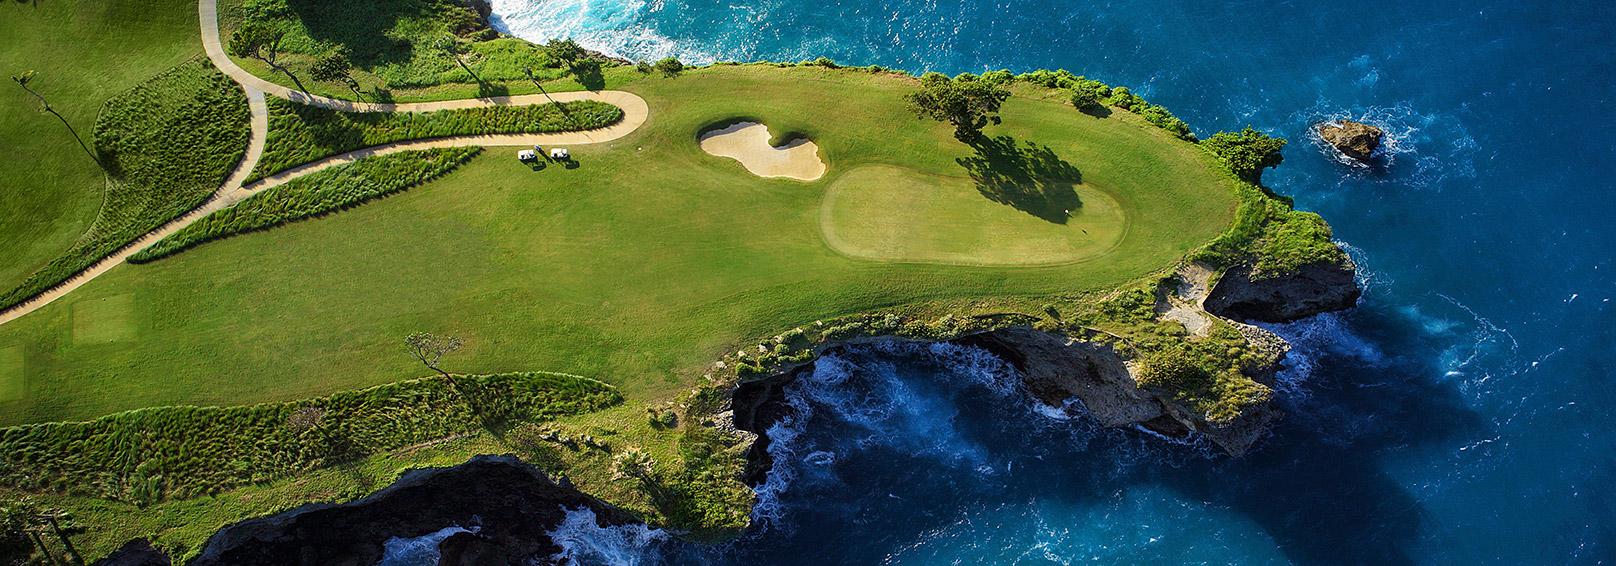 Playa-Grande-Golf